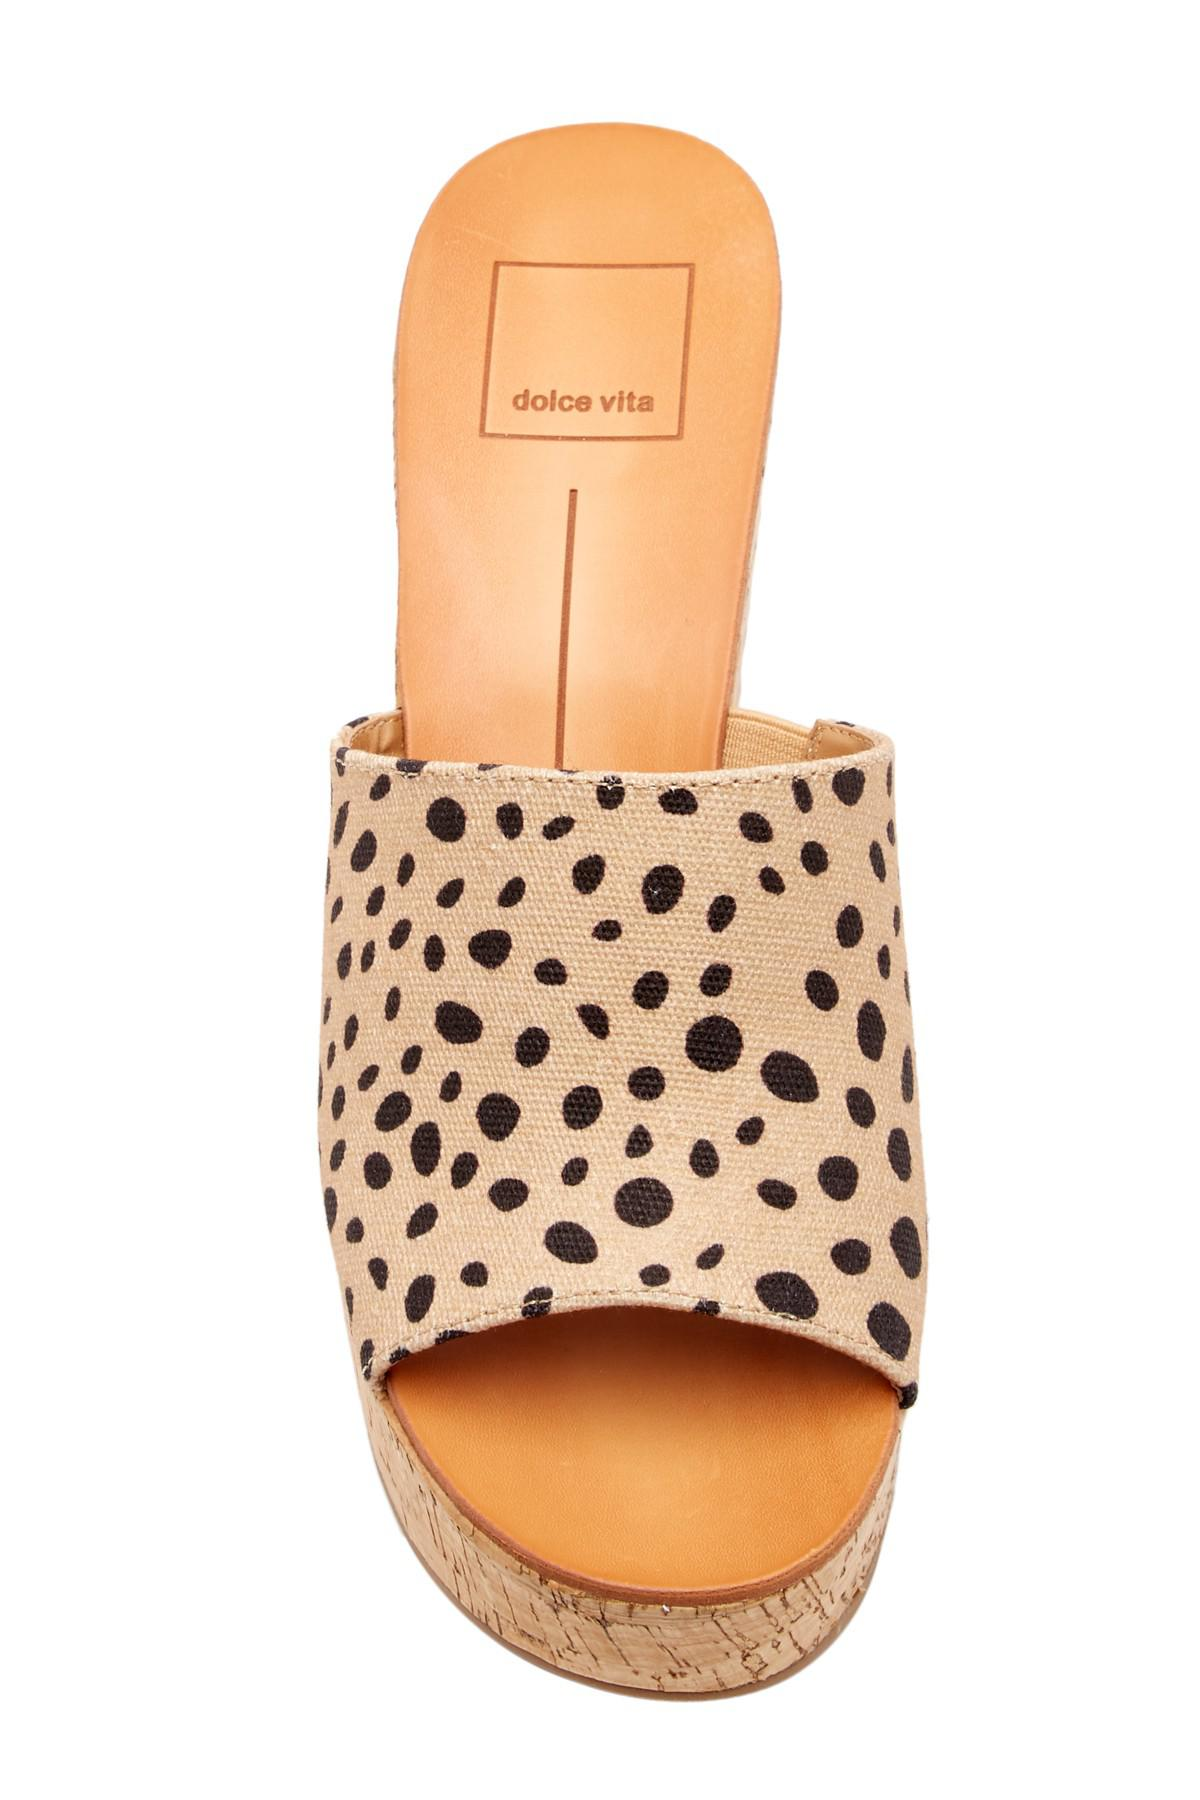 cf9dfafbc16 Dolce Vita Brown Barkley Cork Wedge Sandal